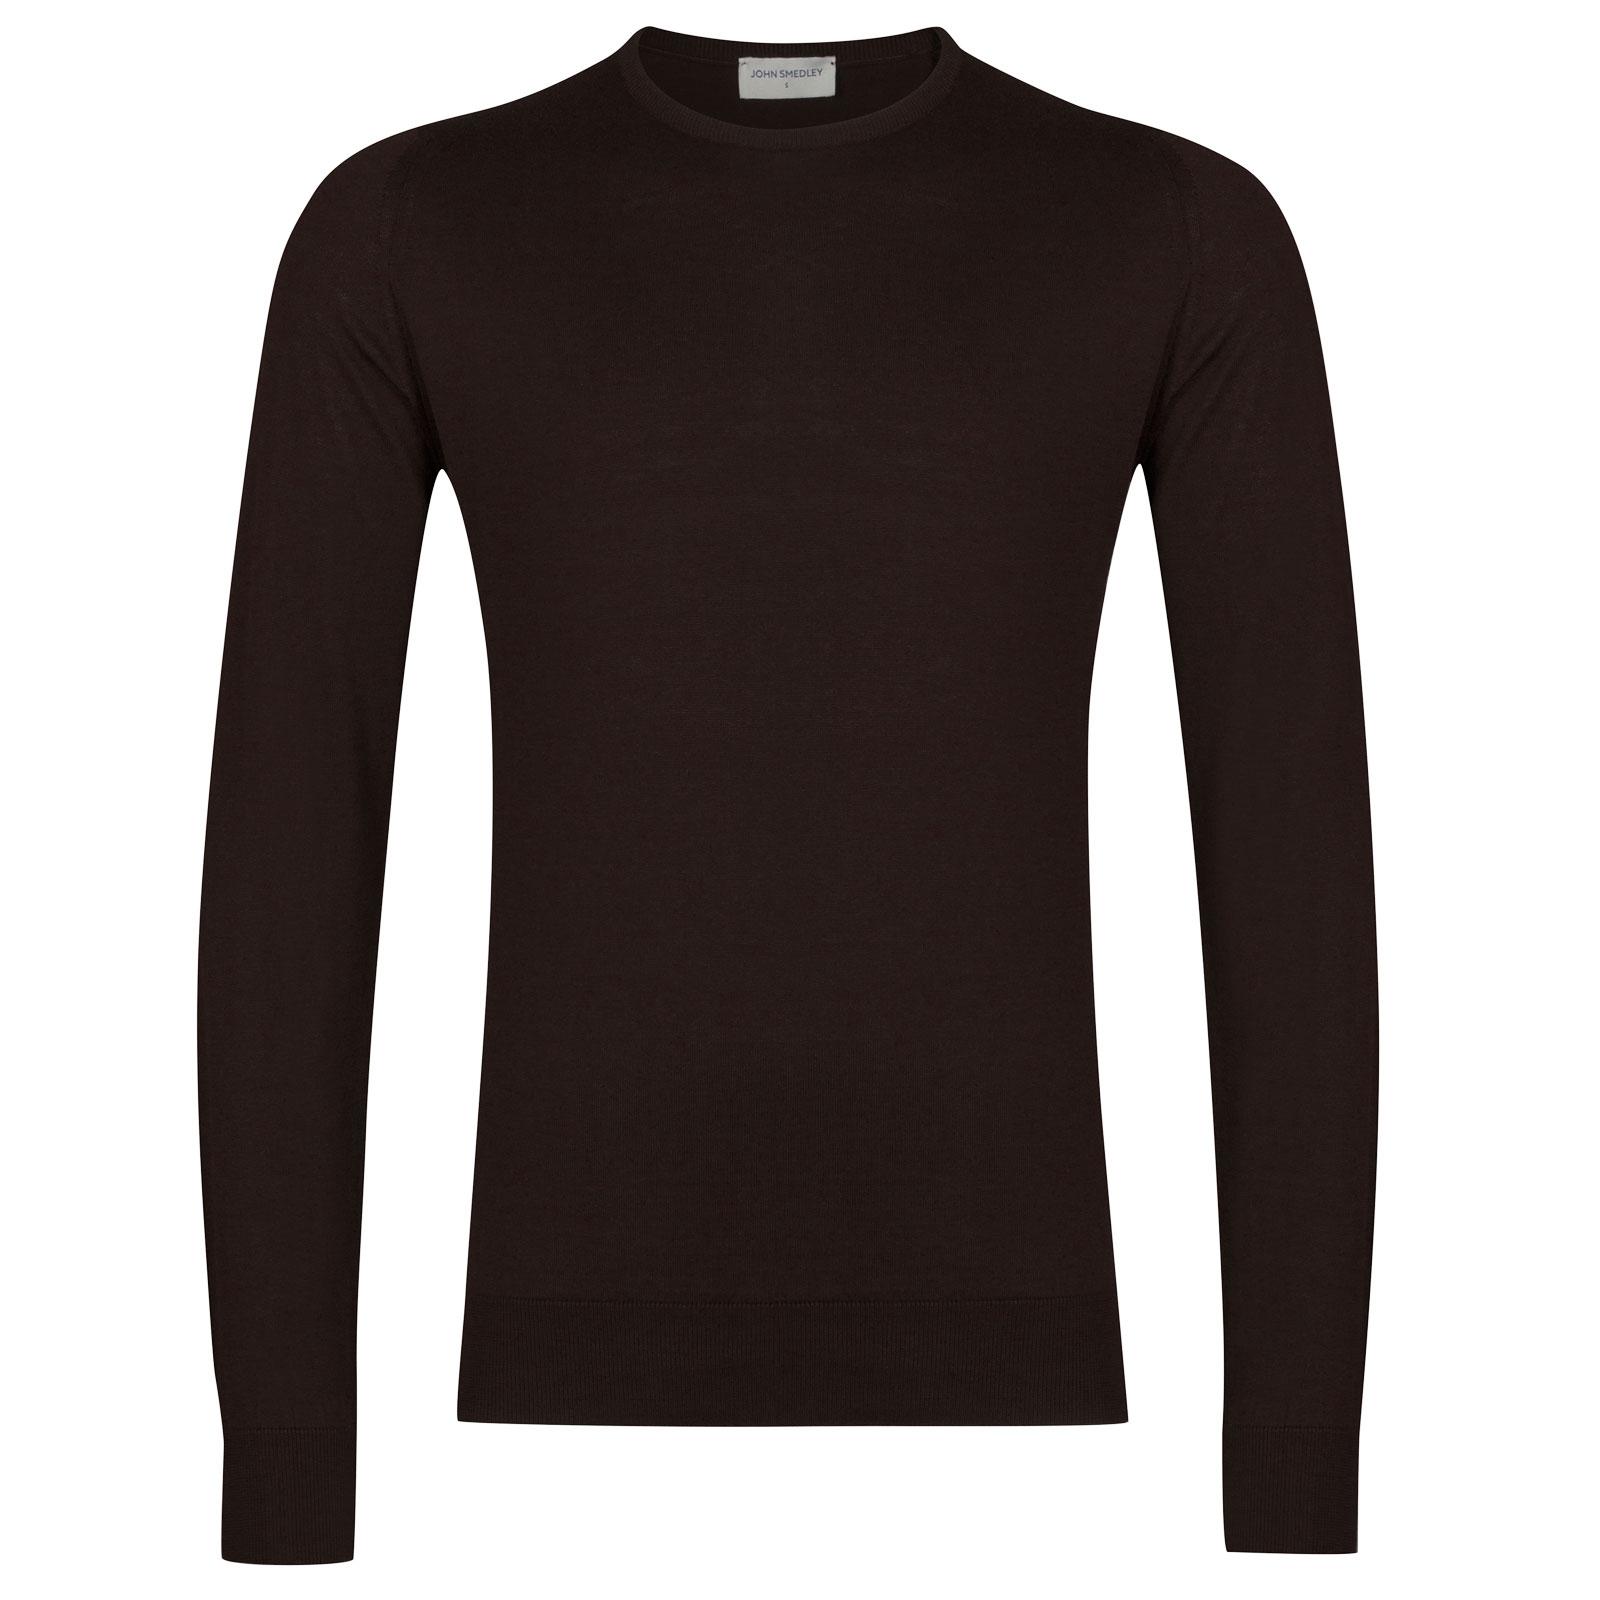 John Smedley Hatfield in Dark Leather Pullover-LGE